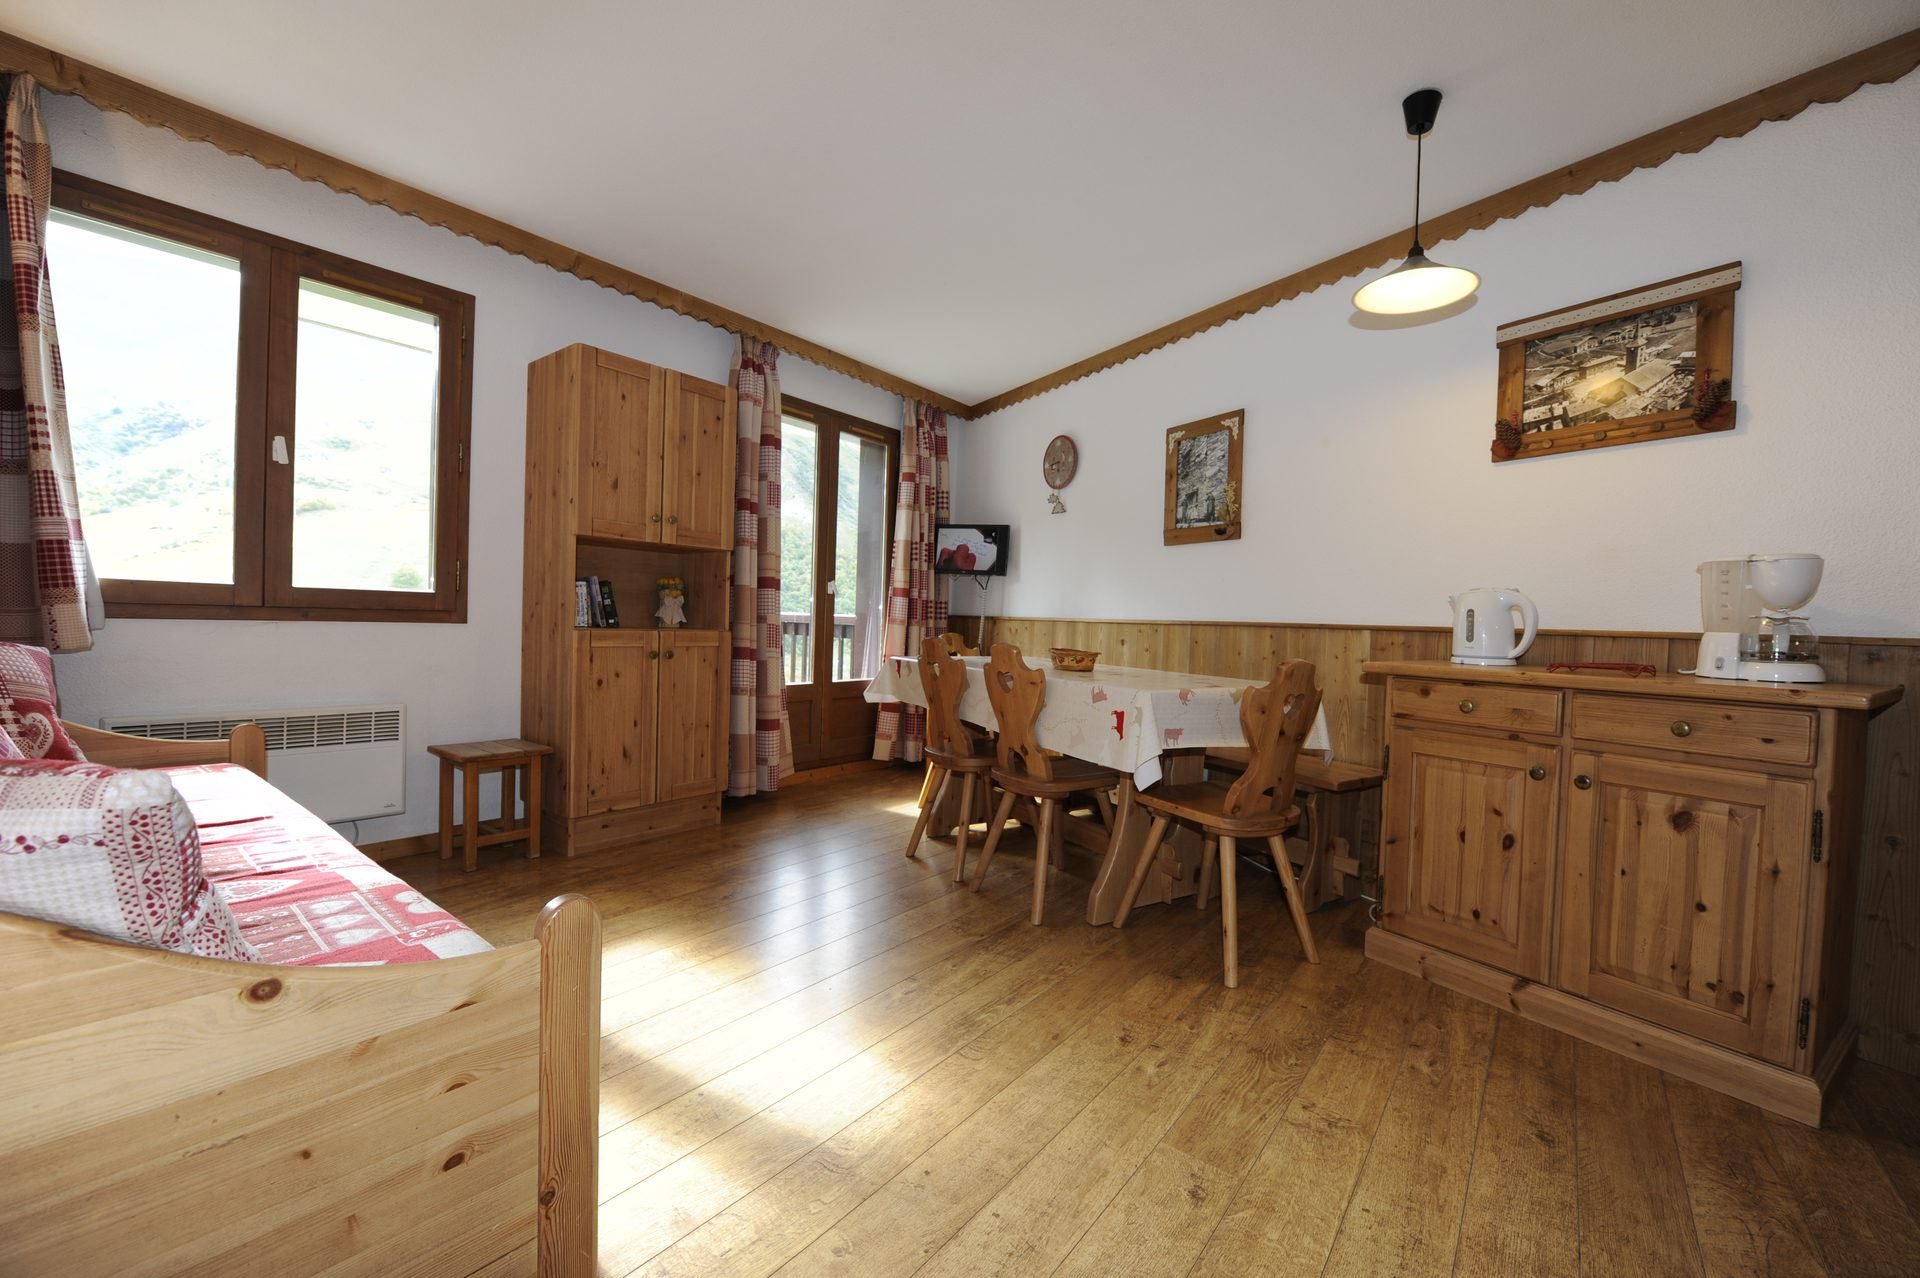 2 Pièces cabine 6 Pers skis aux pieds / BALCONS D'OLYMPIE 1072